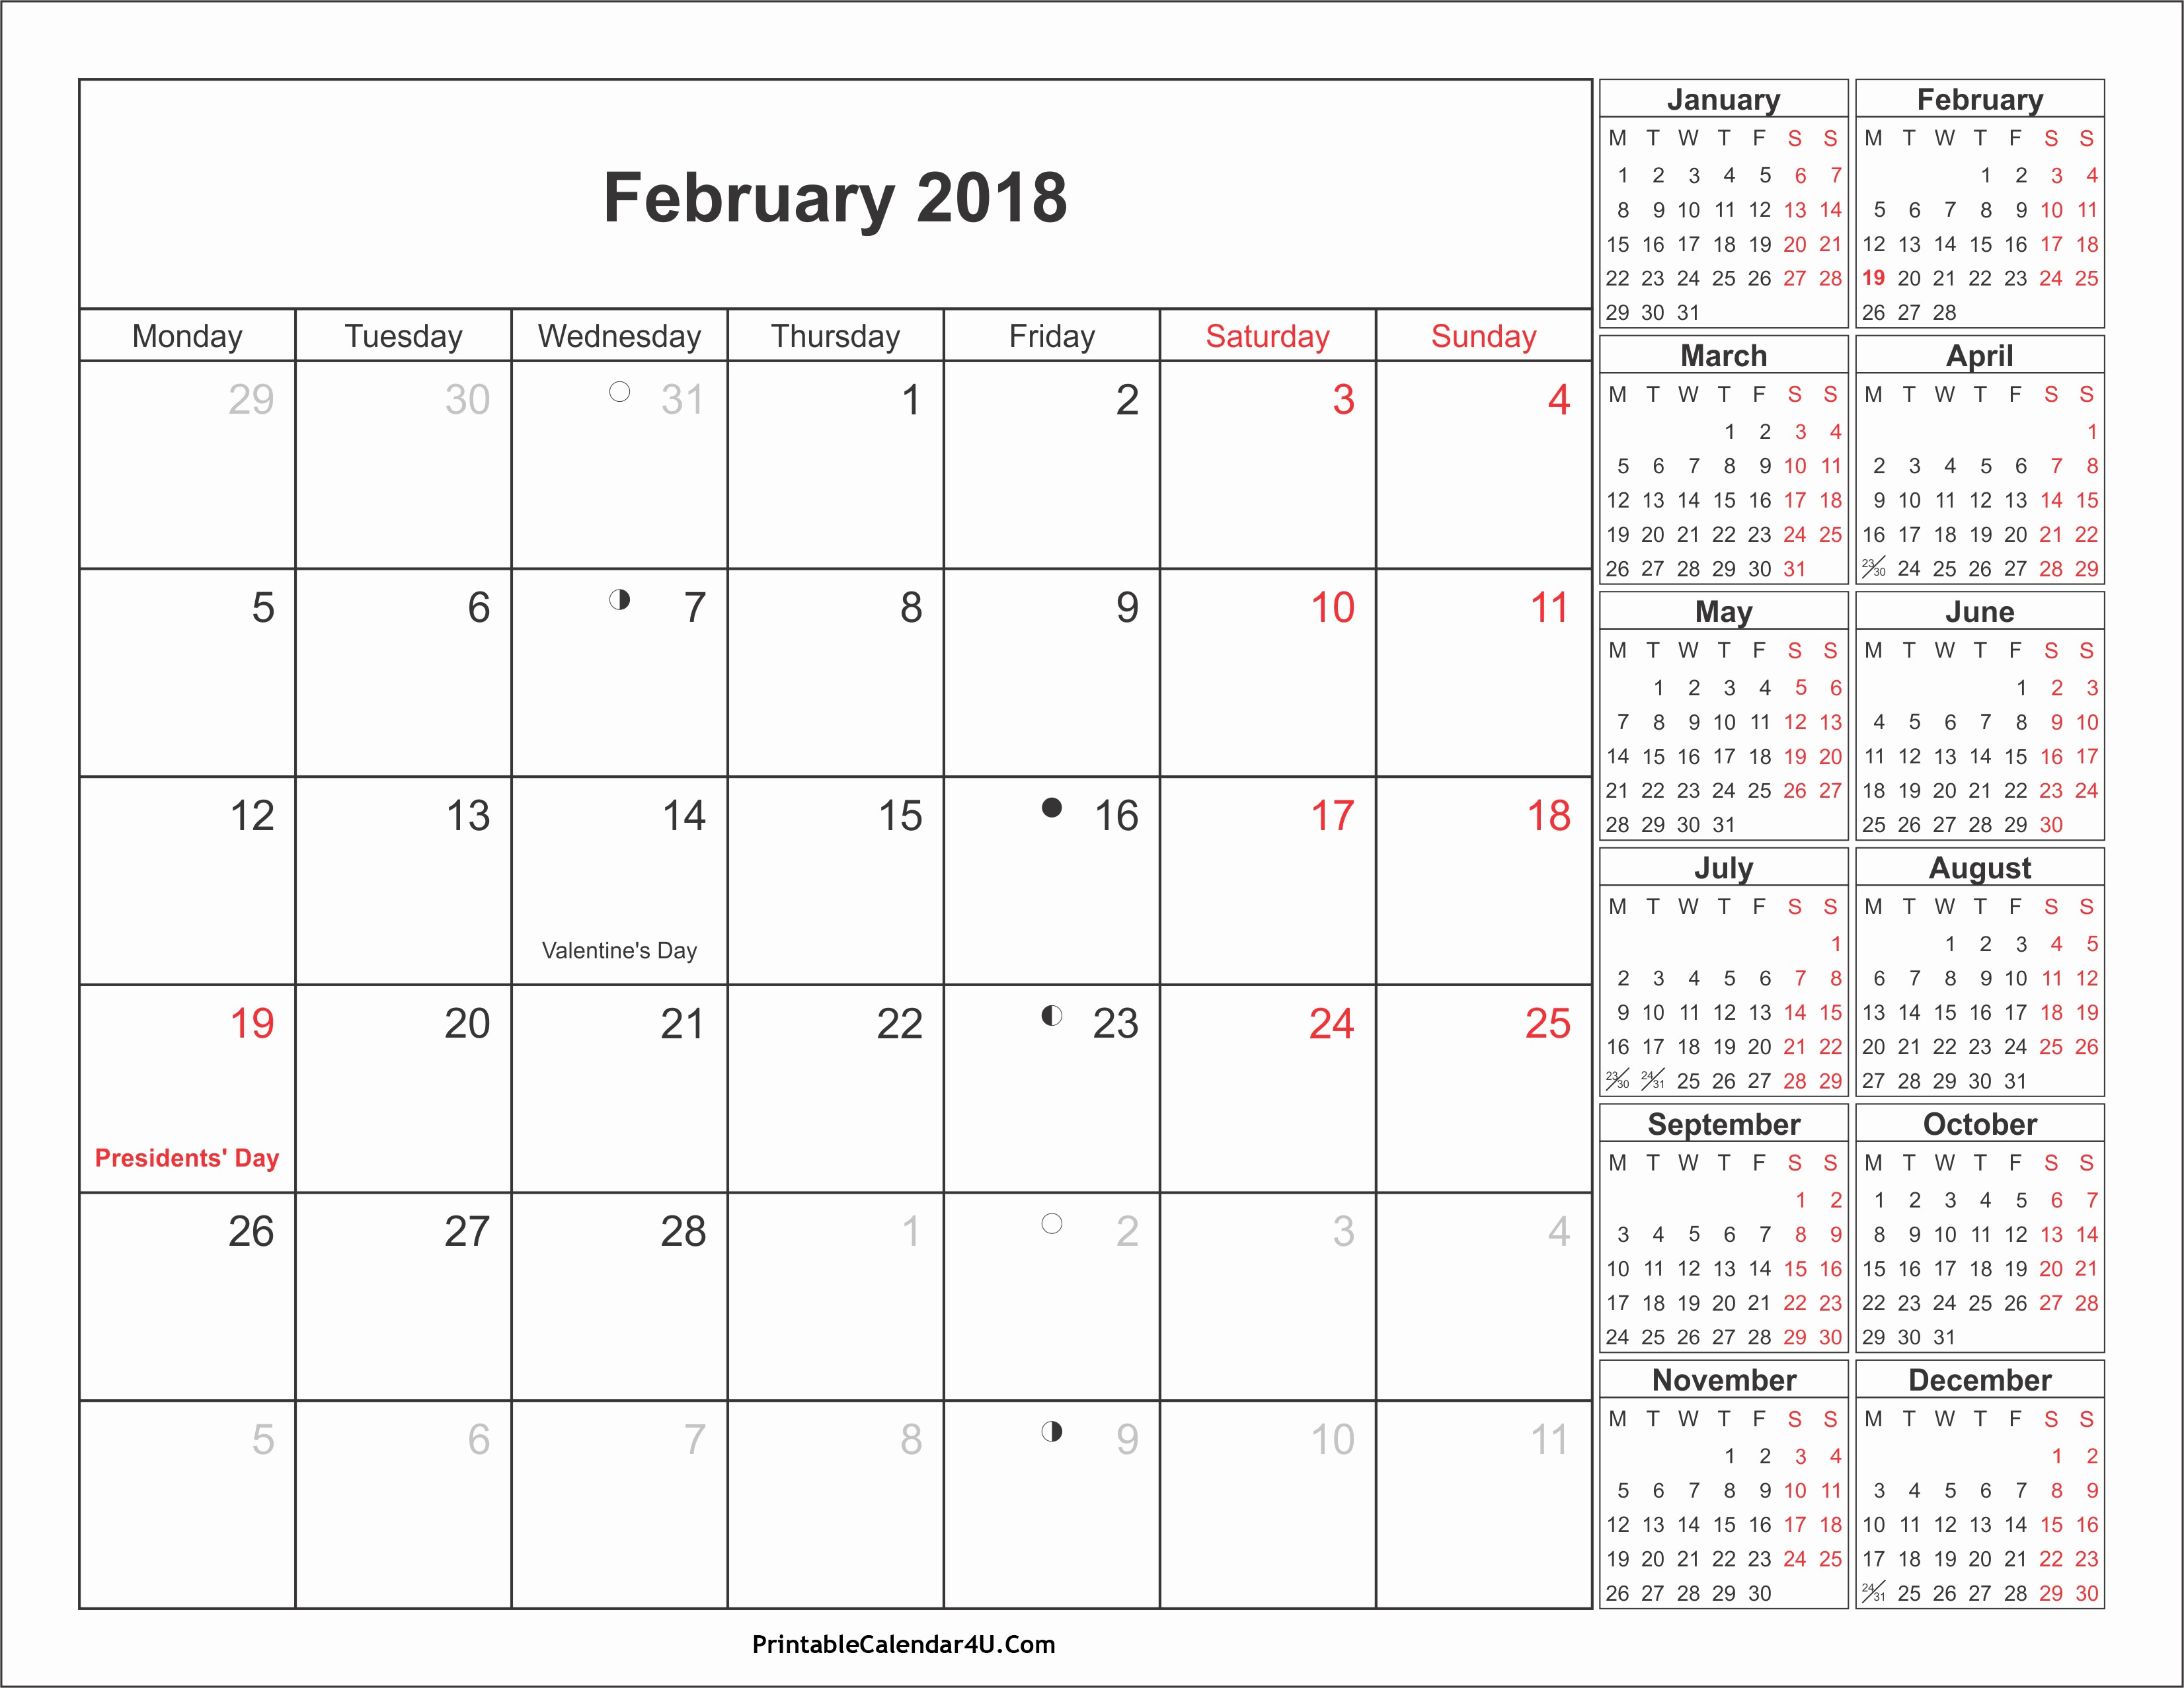 Calendar 2018 Printable with Holidays Elegant February 2018 Calendar Printable with Holidays Pdf and Jpg